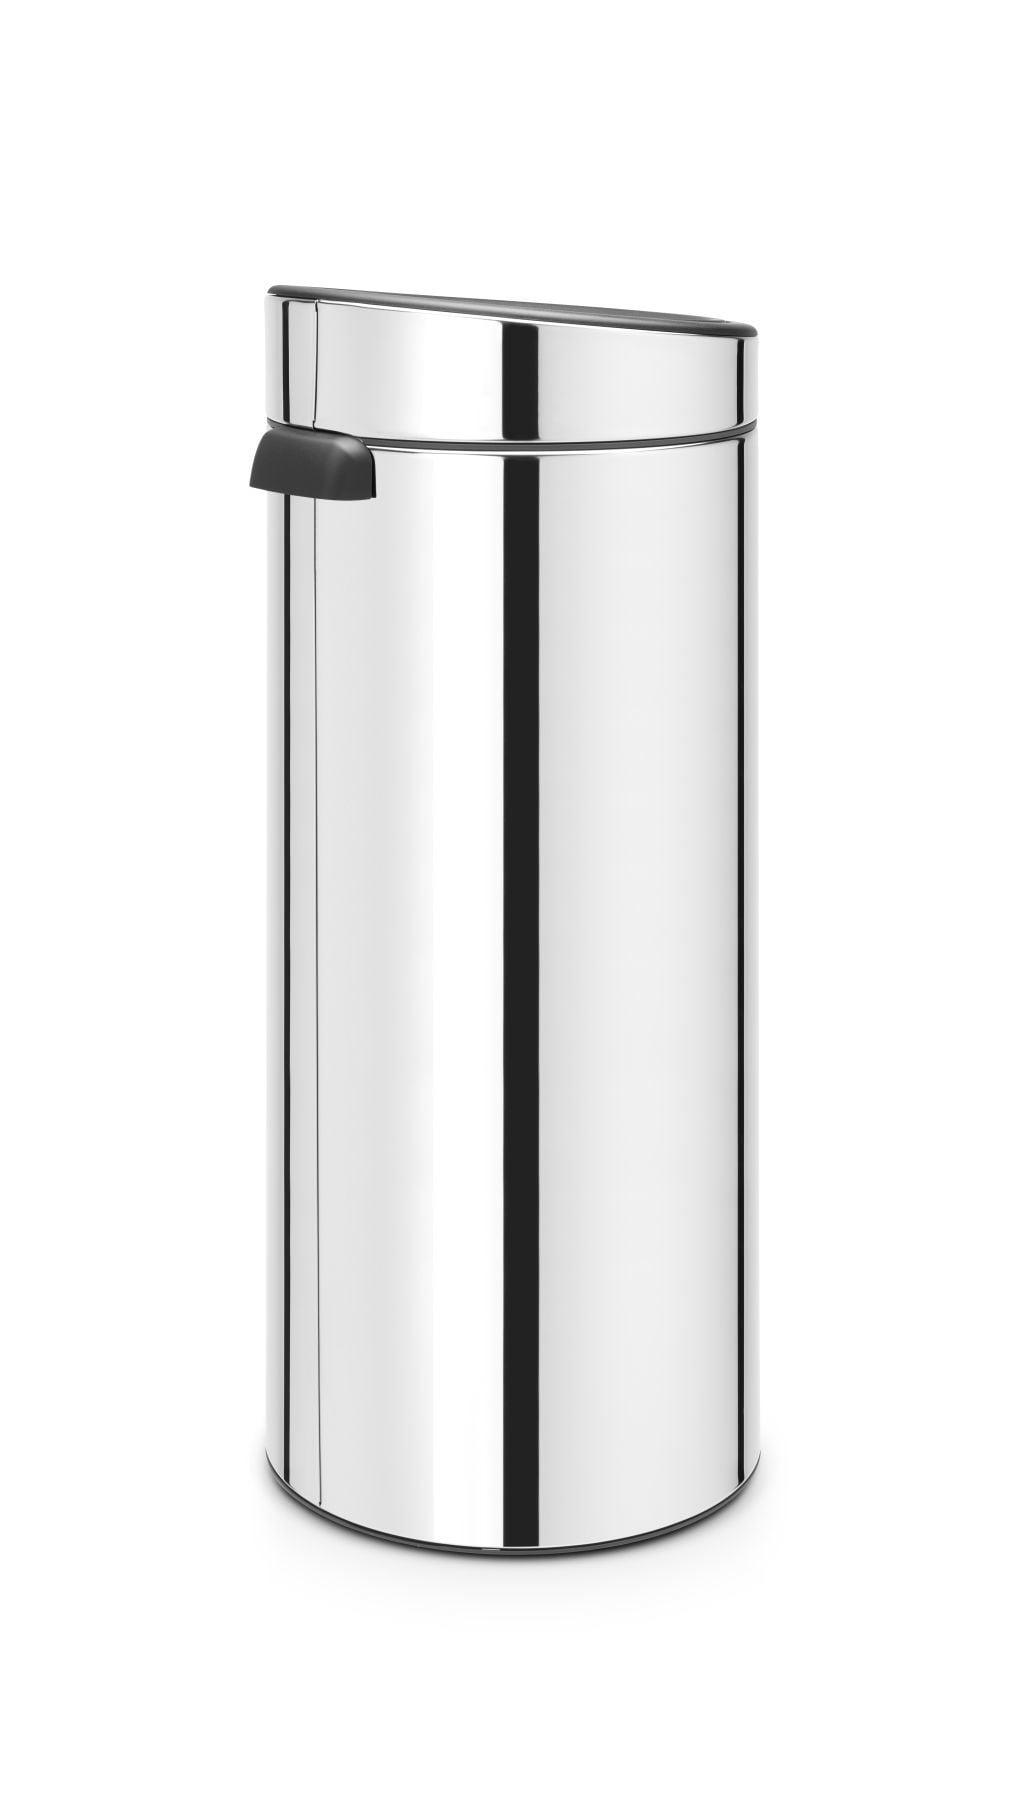 Brabantia 30 Liter Afvalemmer.Brabantia Touch Bin New Afvalemmer 30 Liter Coppens Warenhuis